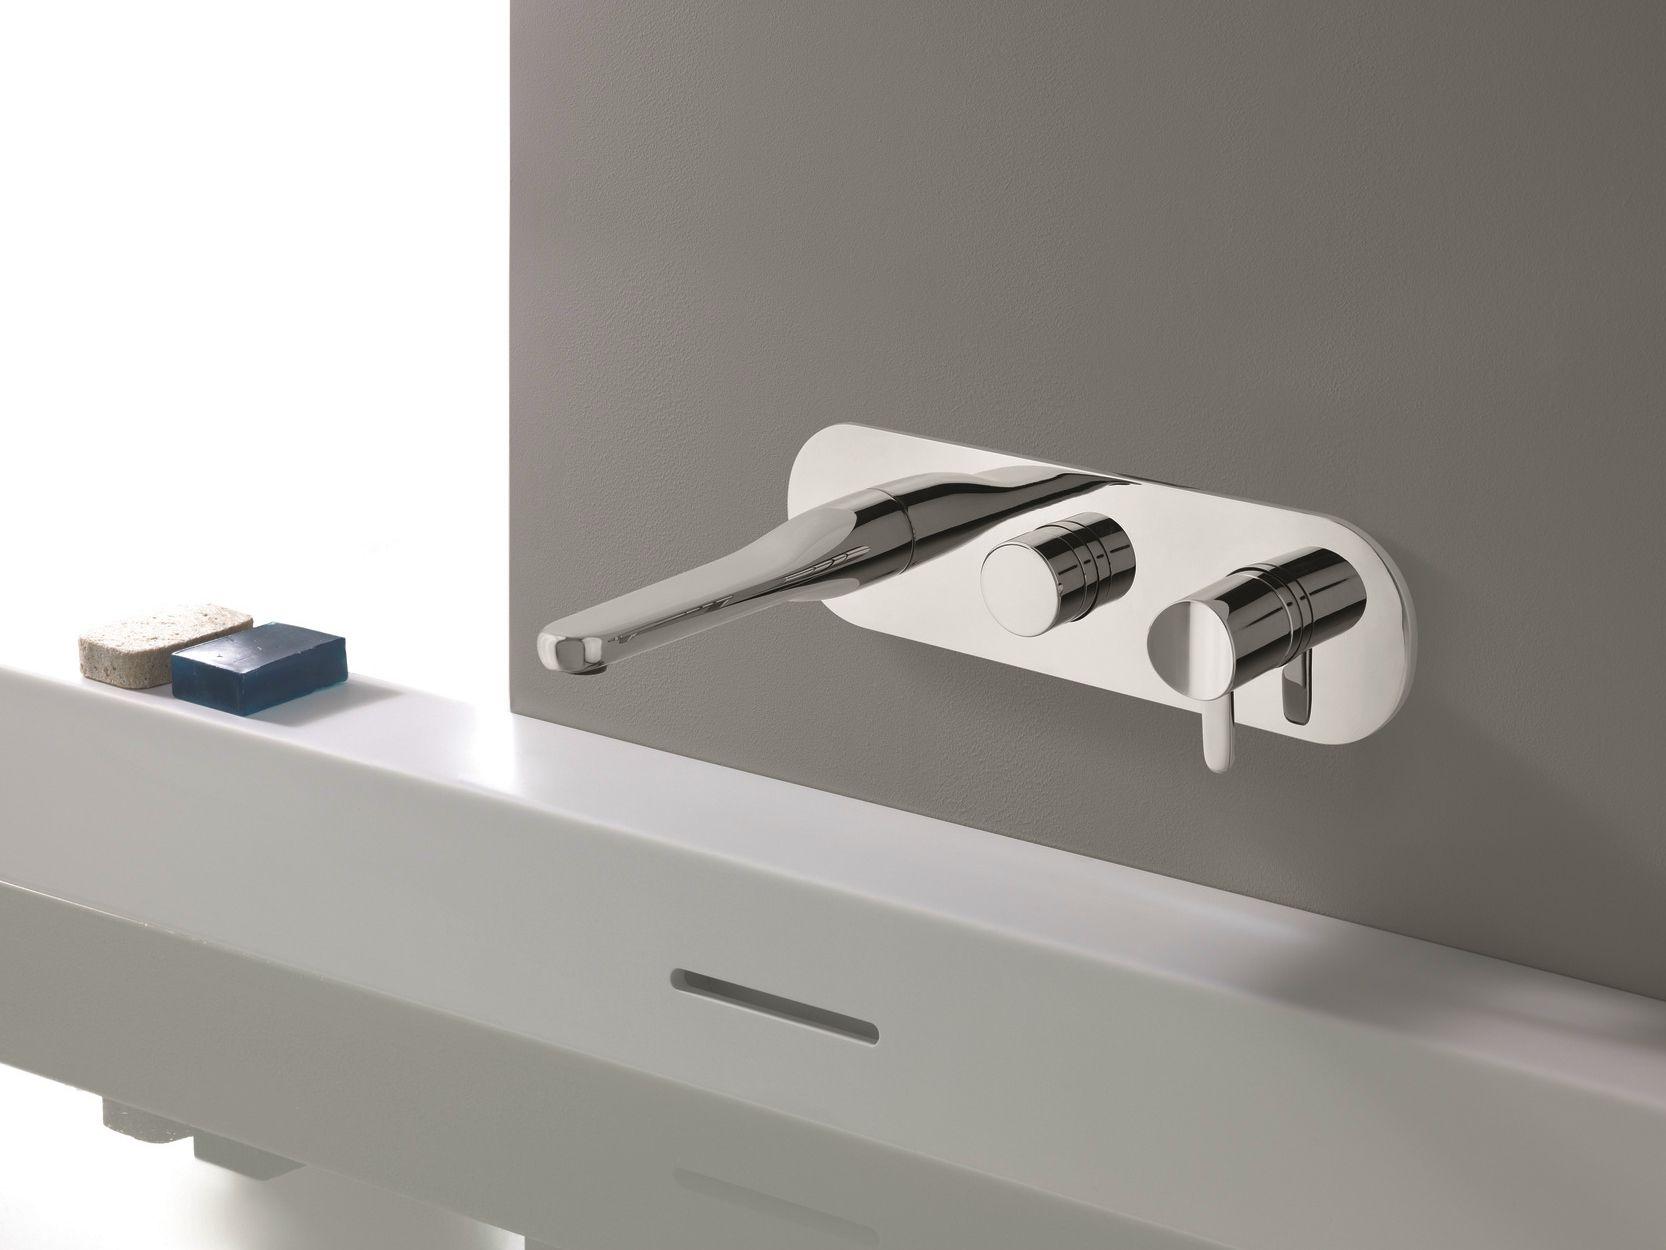 beak robinet pour baignoire by cristina rubinetterie design claudia danelon. Black Bedroom Furniture Sets. Home Design Ideas